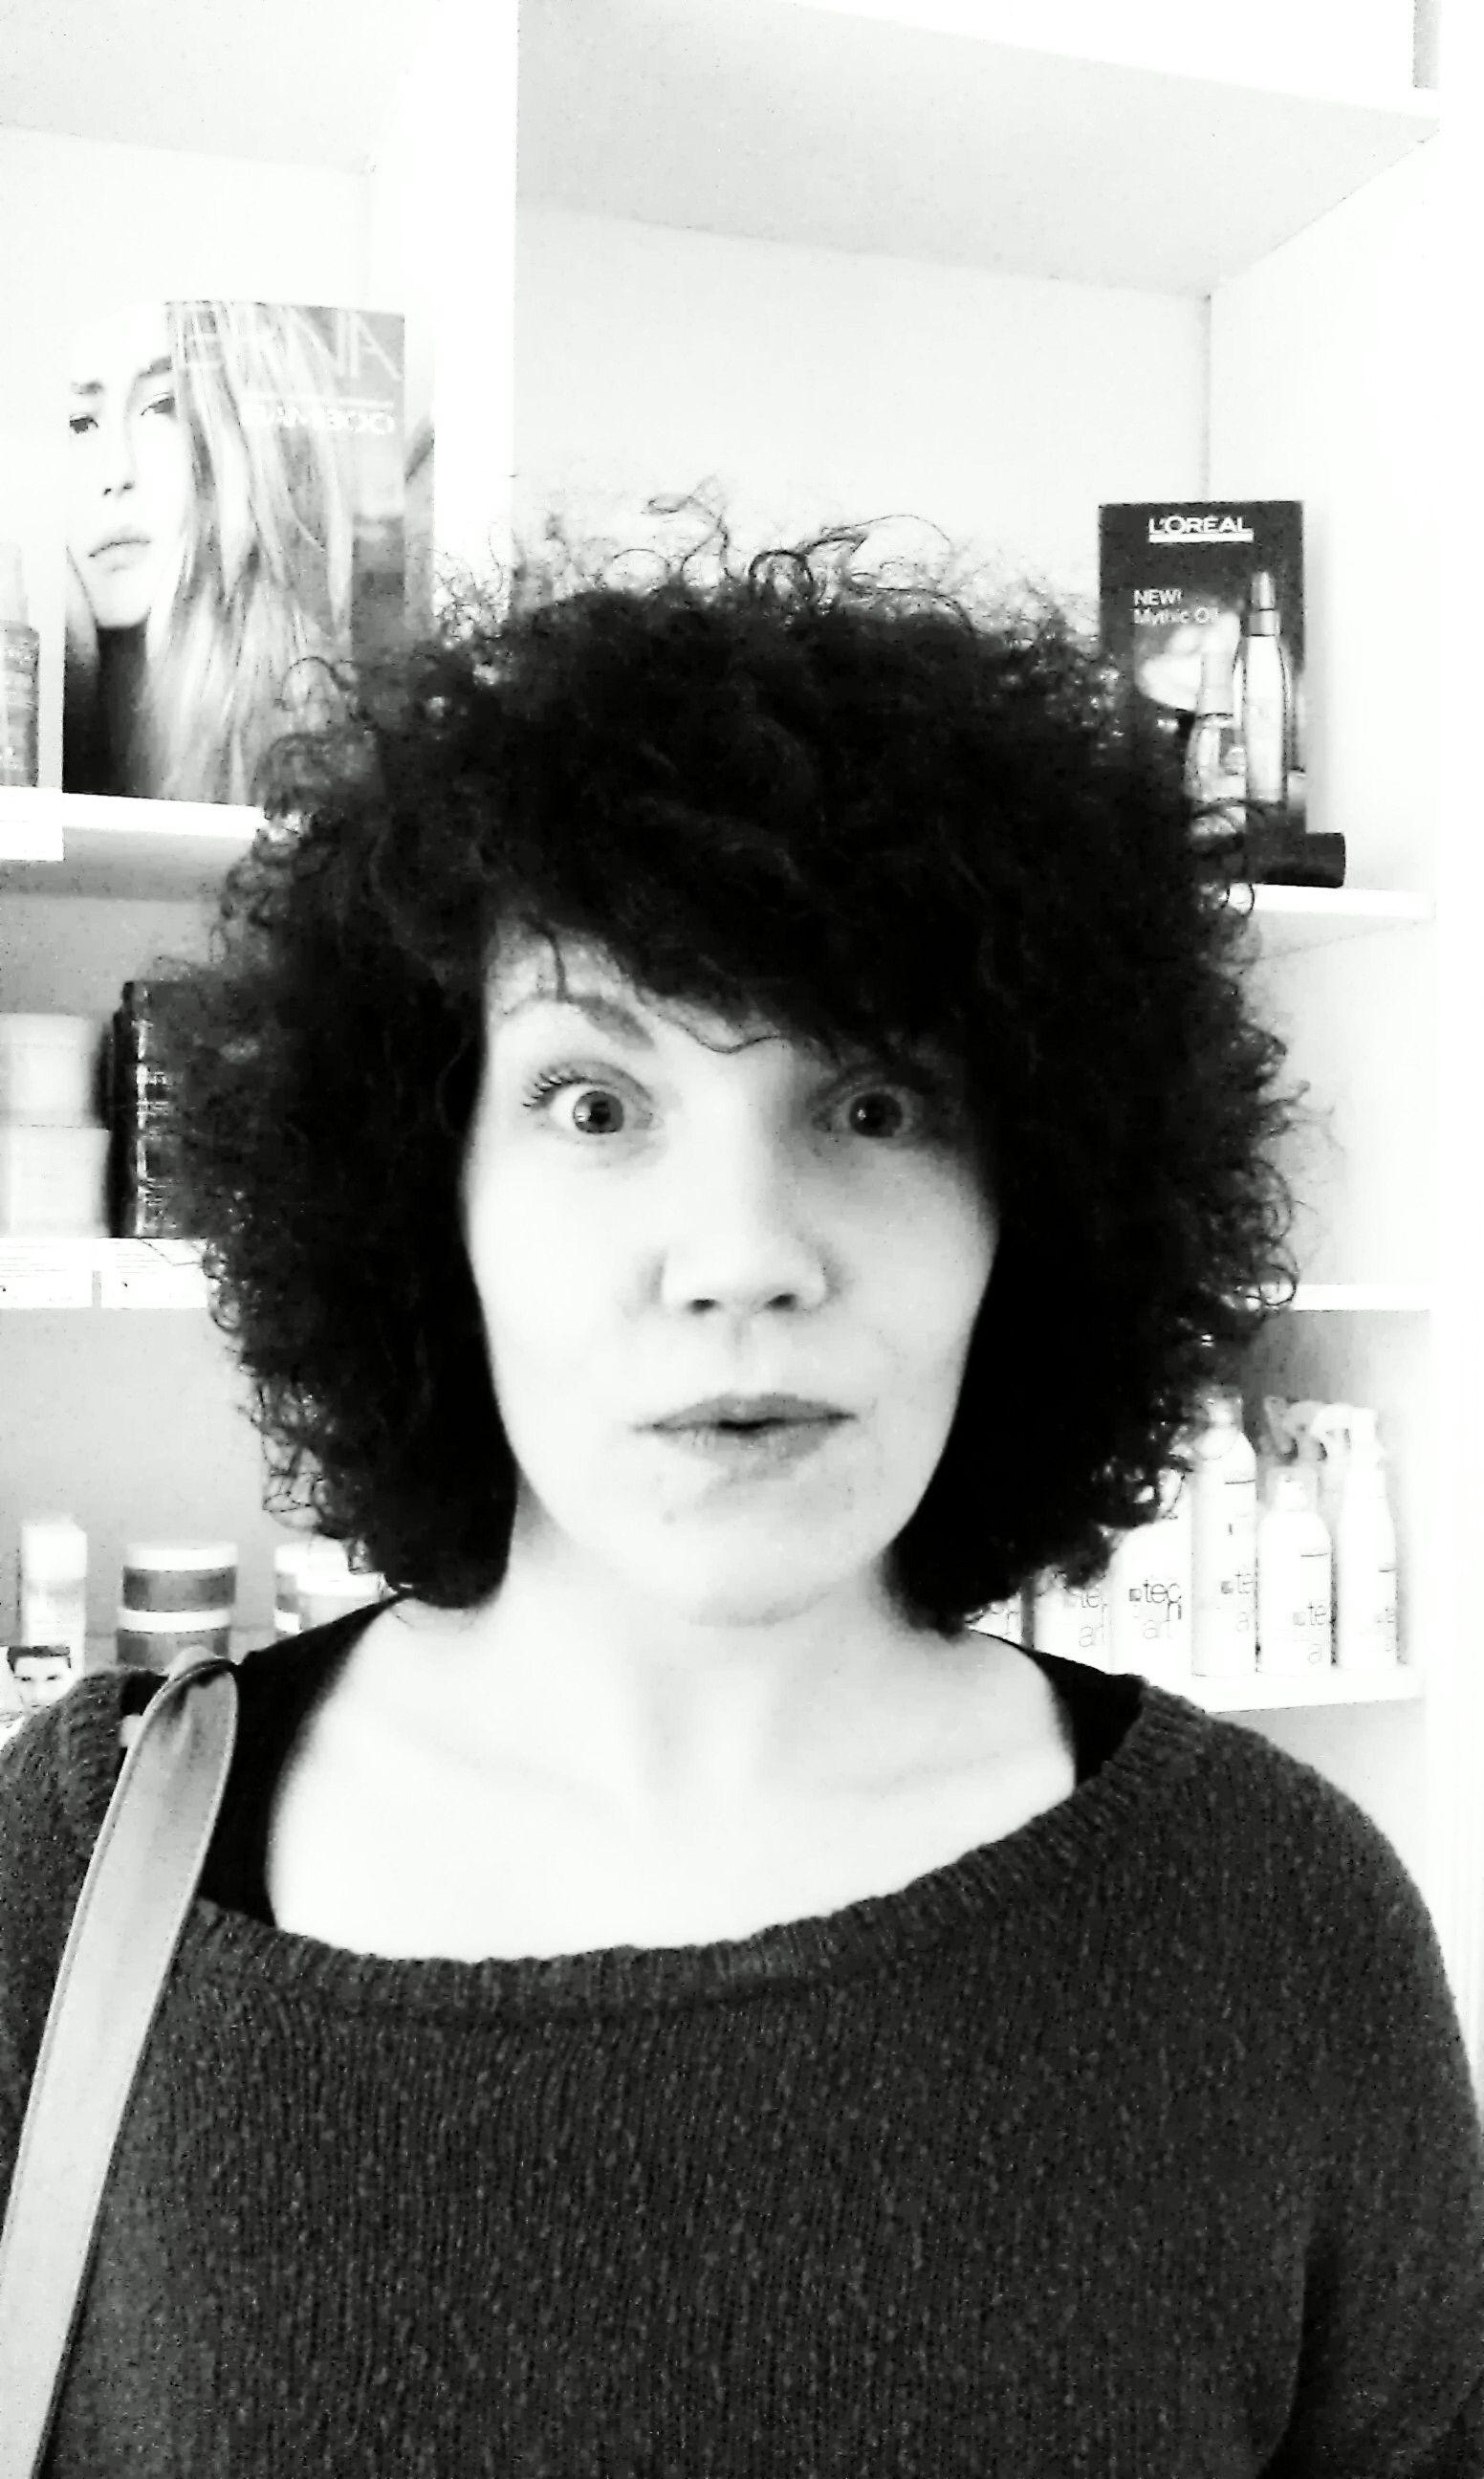 Curlysue